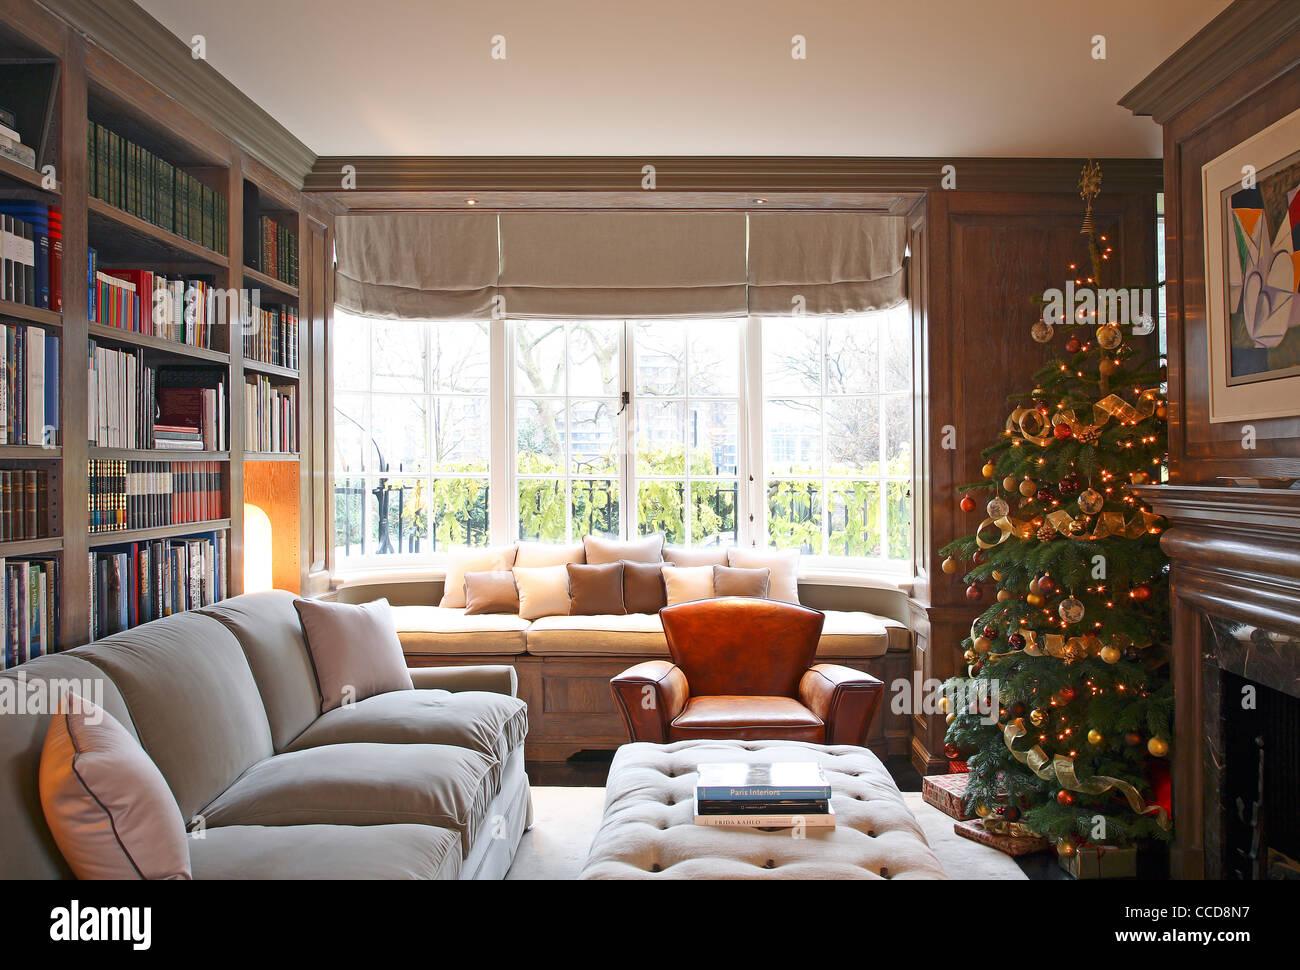 Private house, Stiff + Trevillion Architects Ltd, London, UK, 2010, Family room - Stock Image